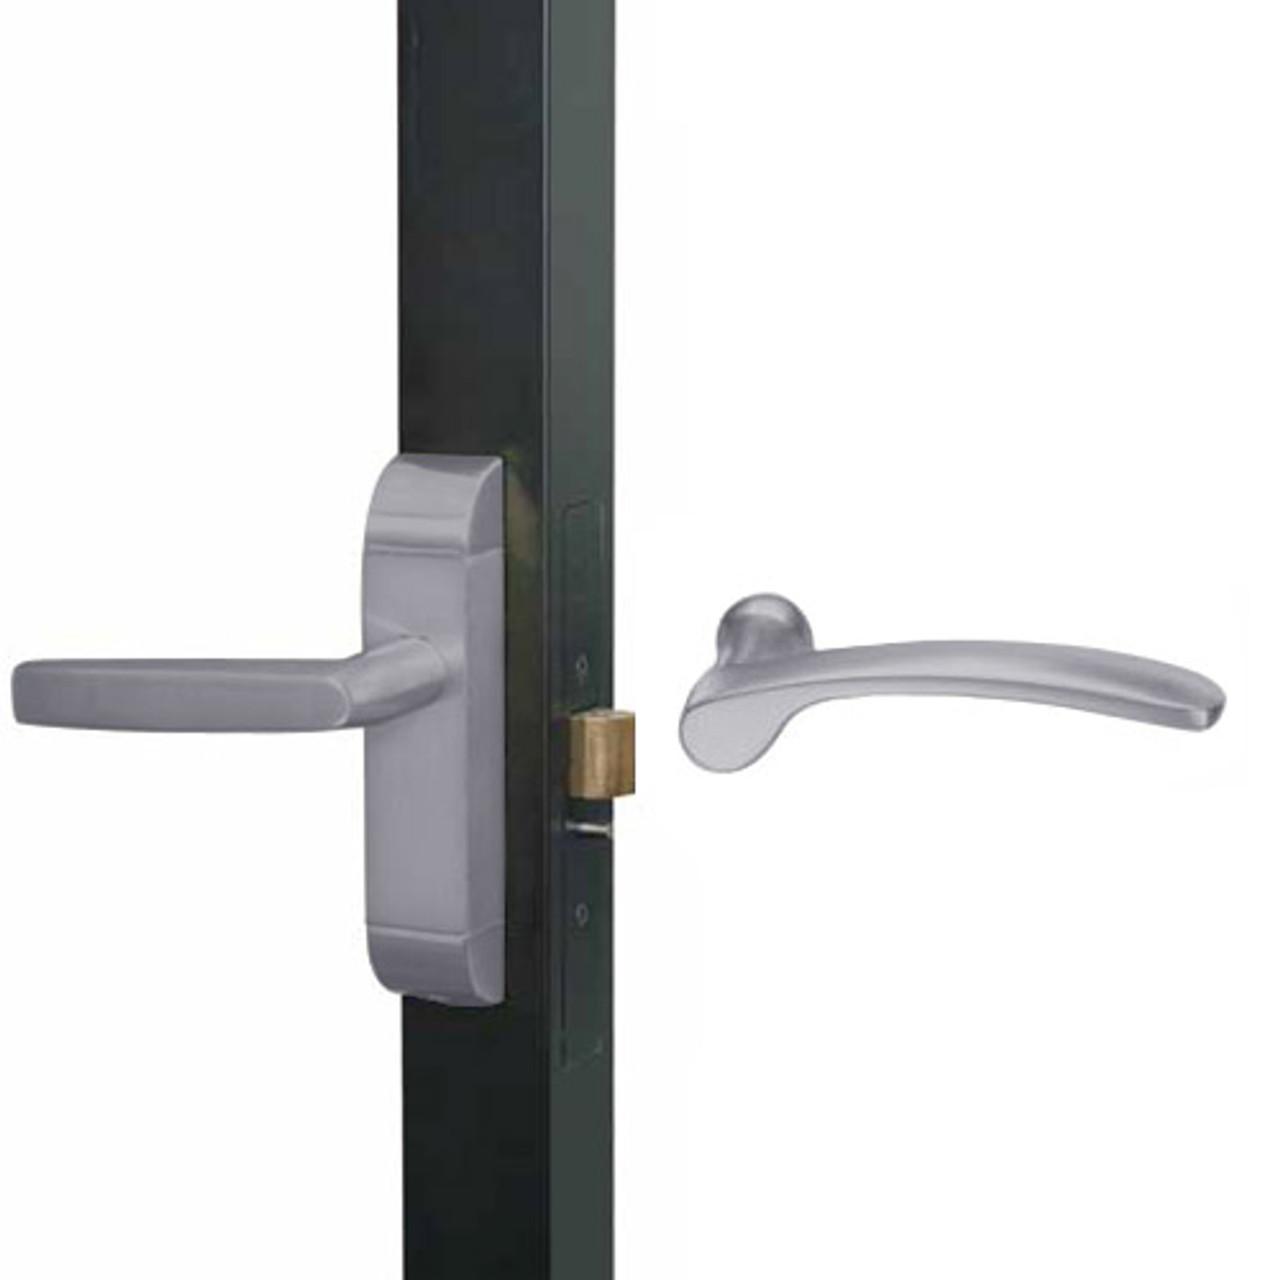 4600-MN-651-US32D Adams Rite MN Designer Deadlatch handle in Satin Stainless Finish